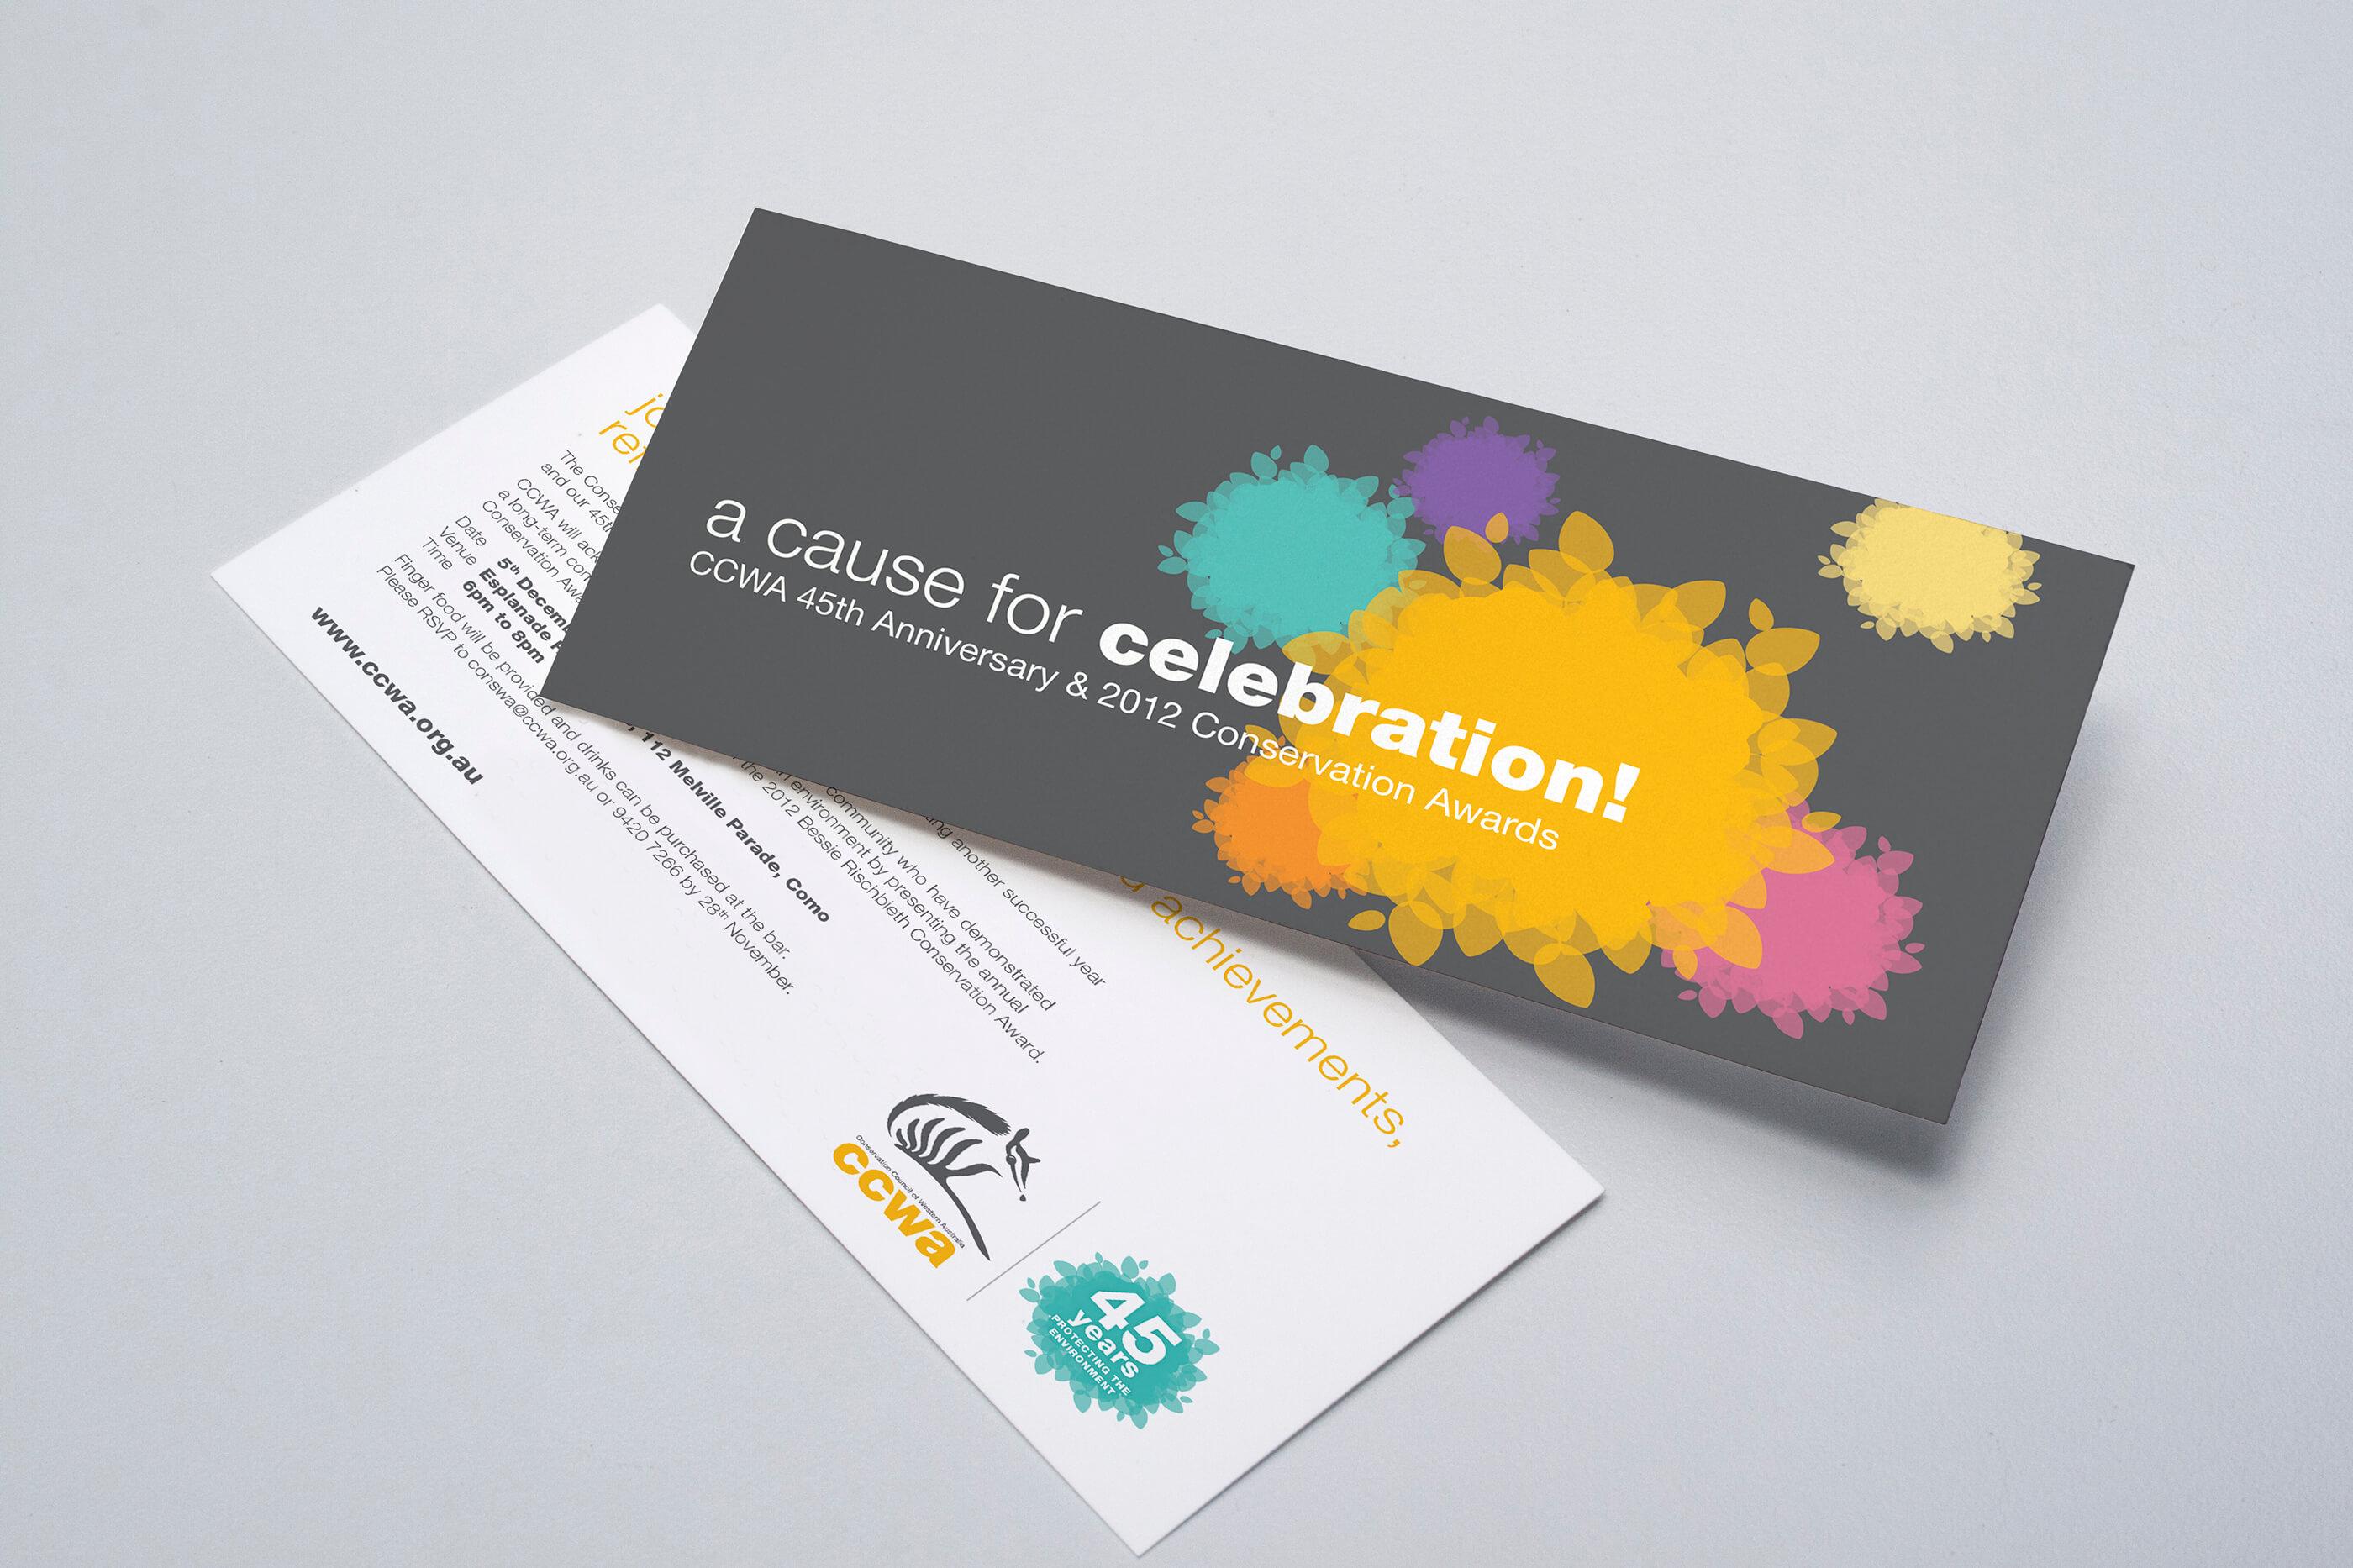 ccwa-invitation-conservation-awards